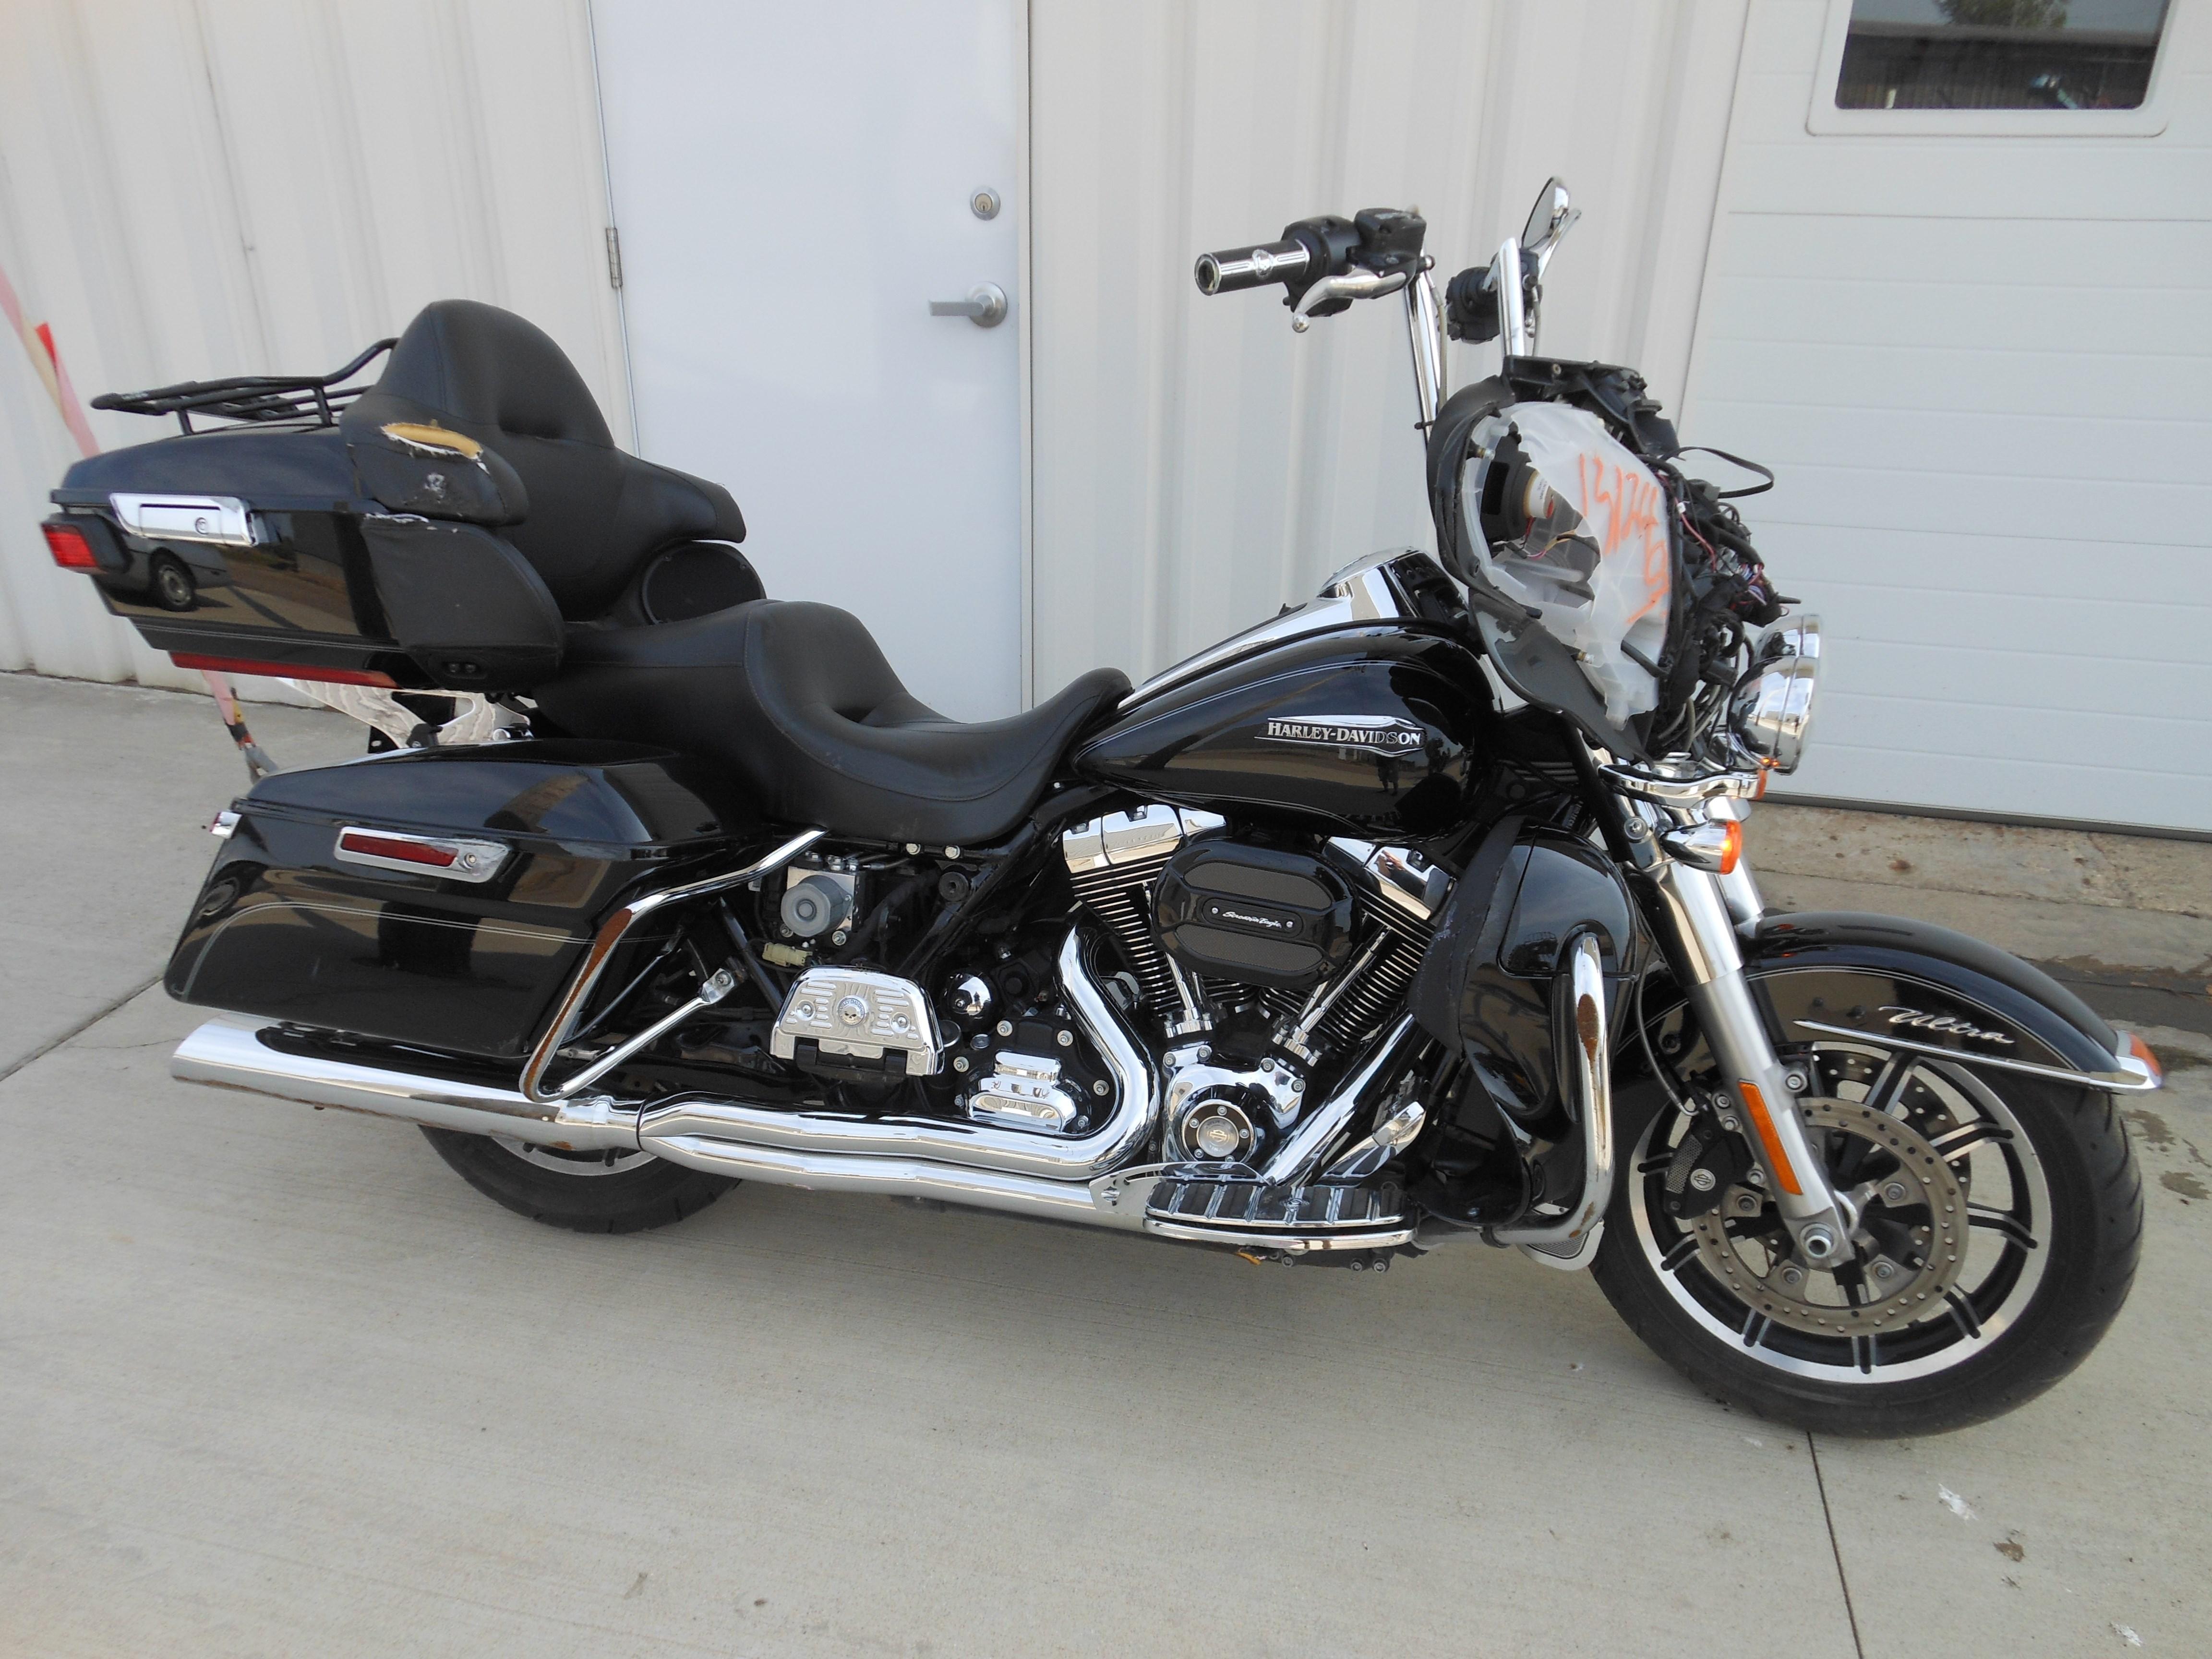 2010 To 2016 New Amp Used Harley DavidsonR Touring Electra